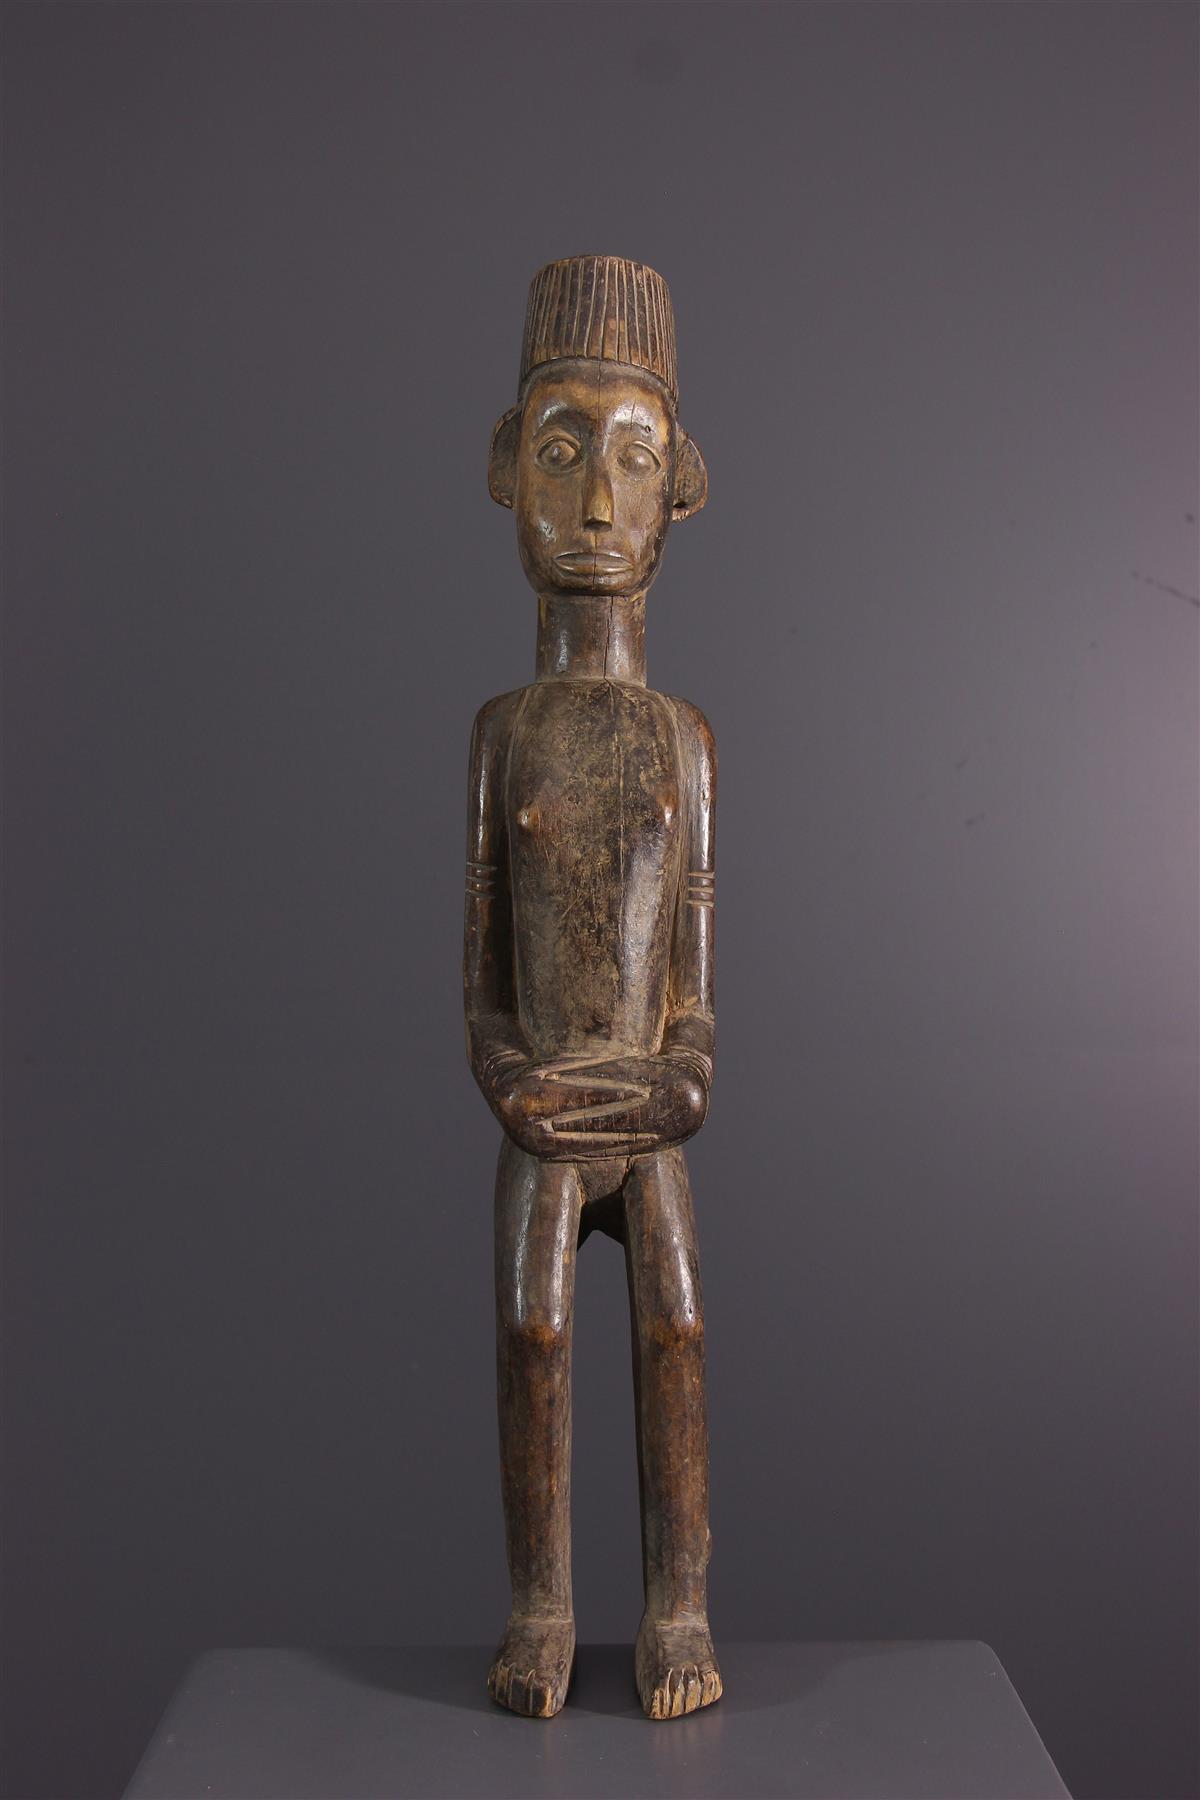 Ewe colon - Afrikaanse kunst